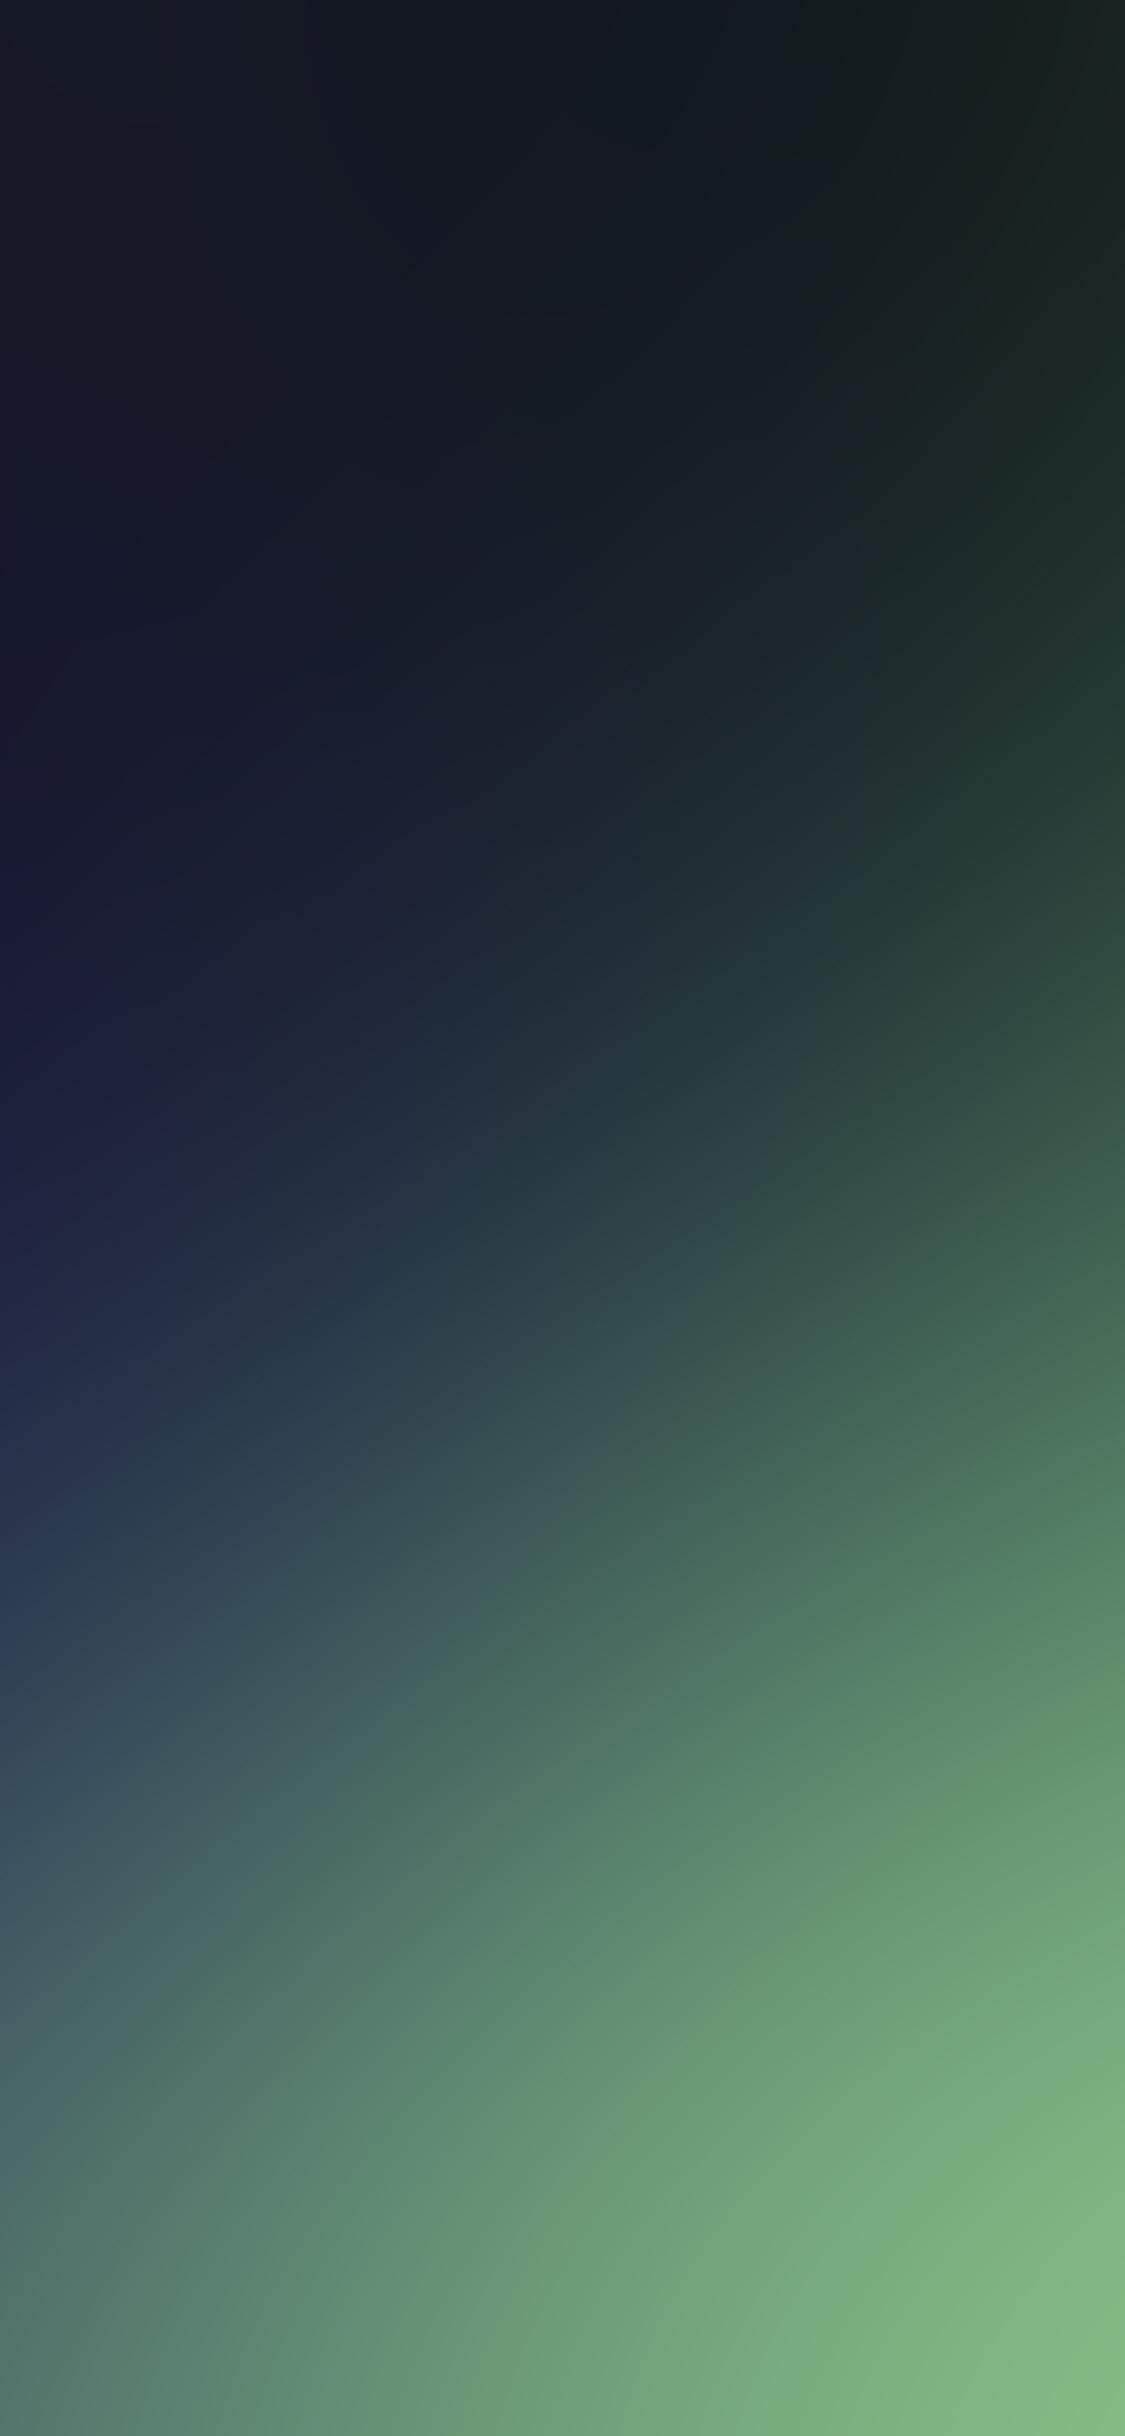 iPhonexpapers.com-Apple-iPhone-wallpaper-sm86-blue-green-soft-blur-gradation